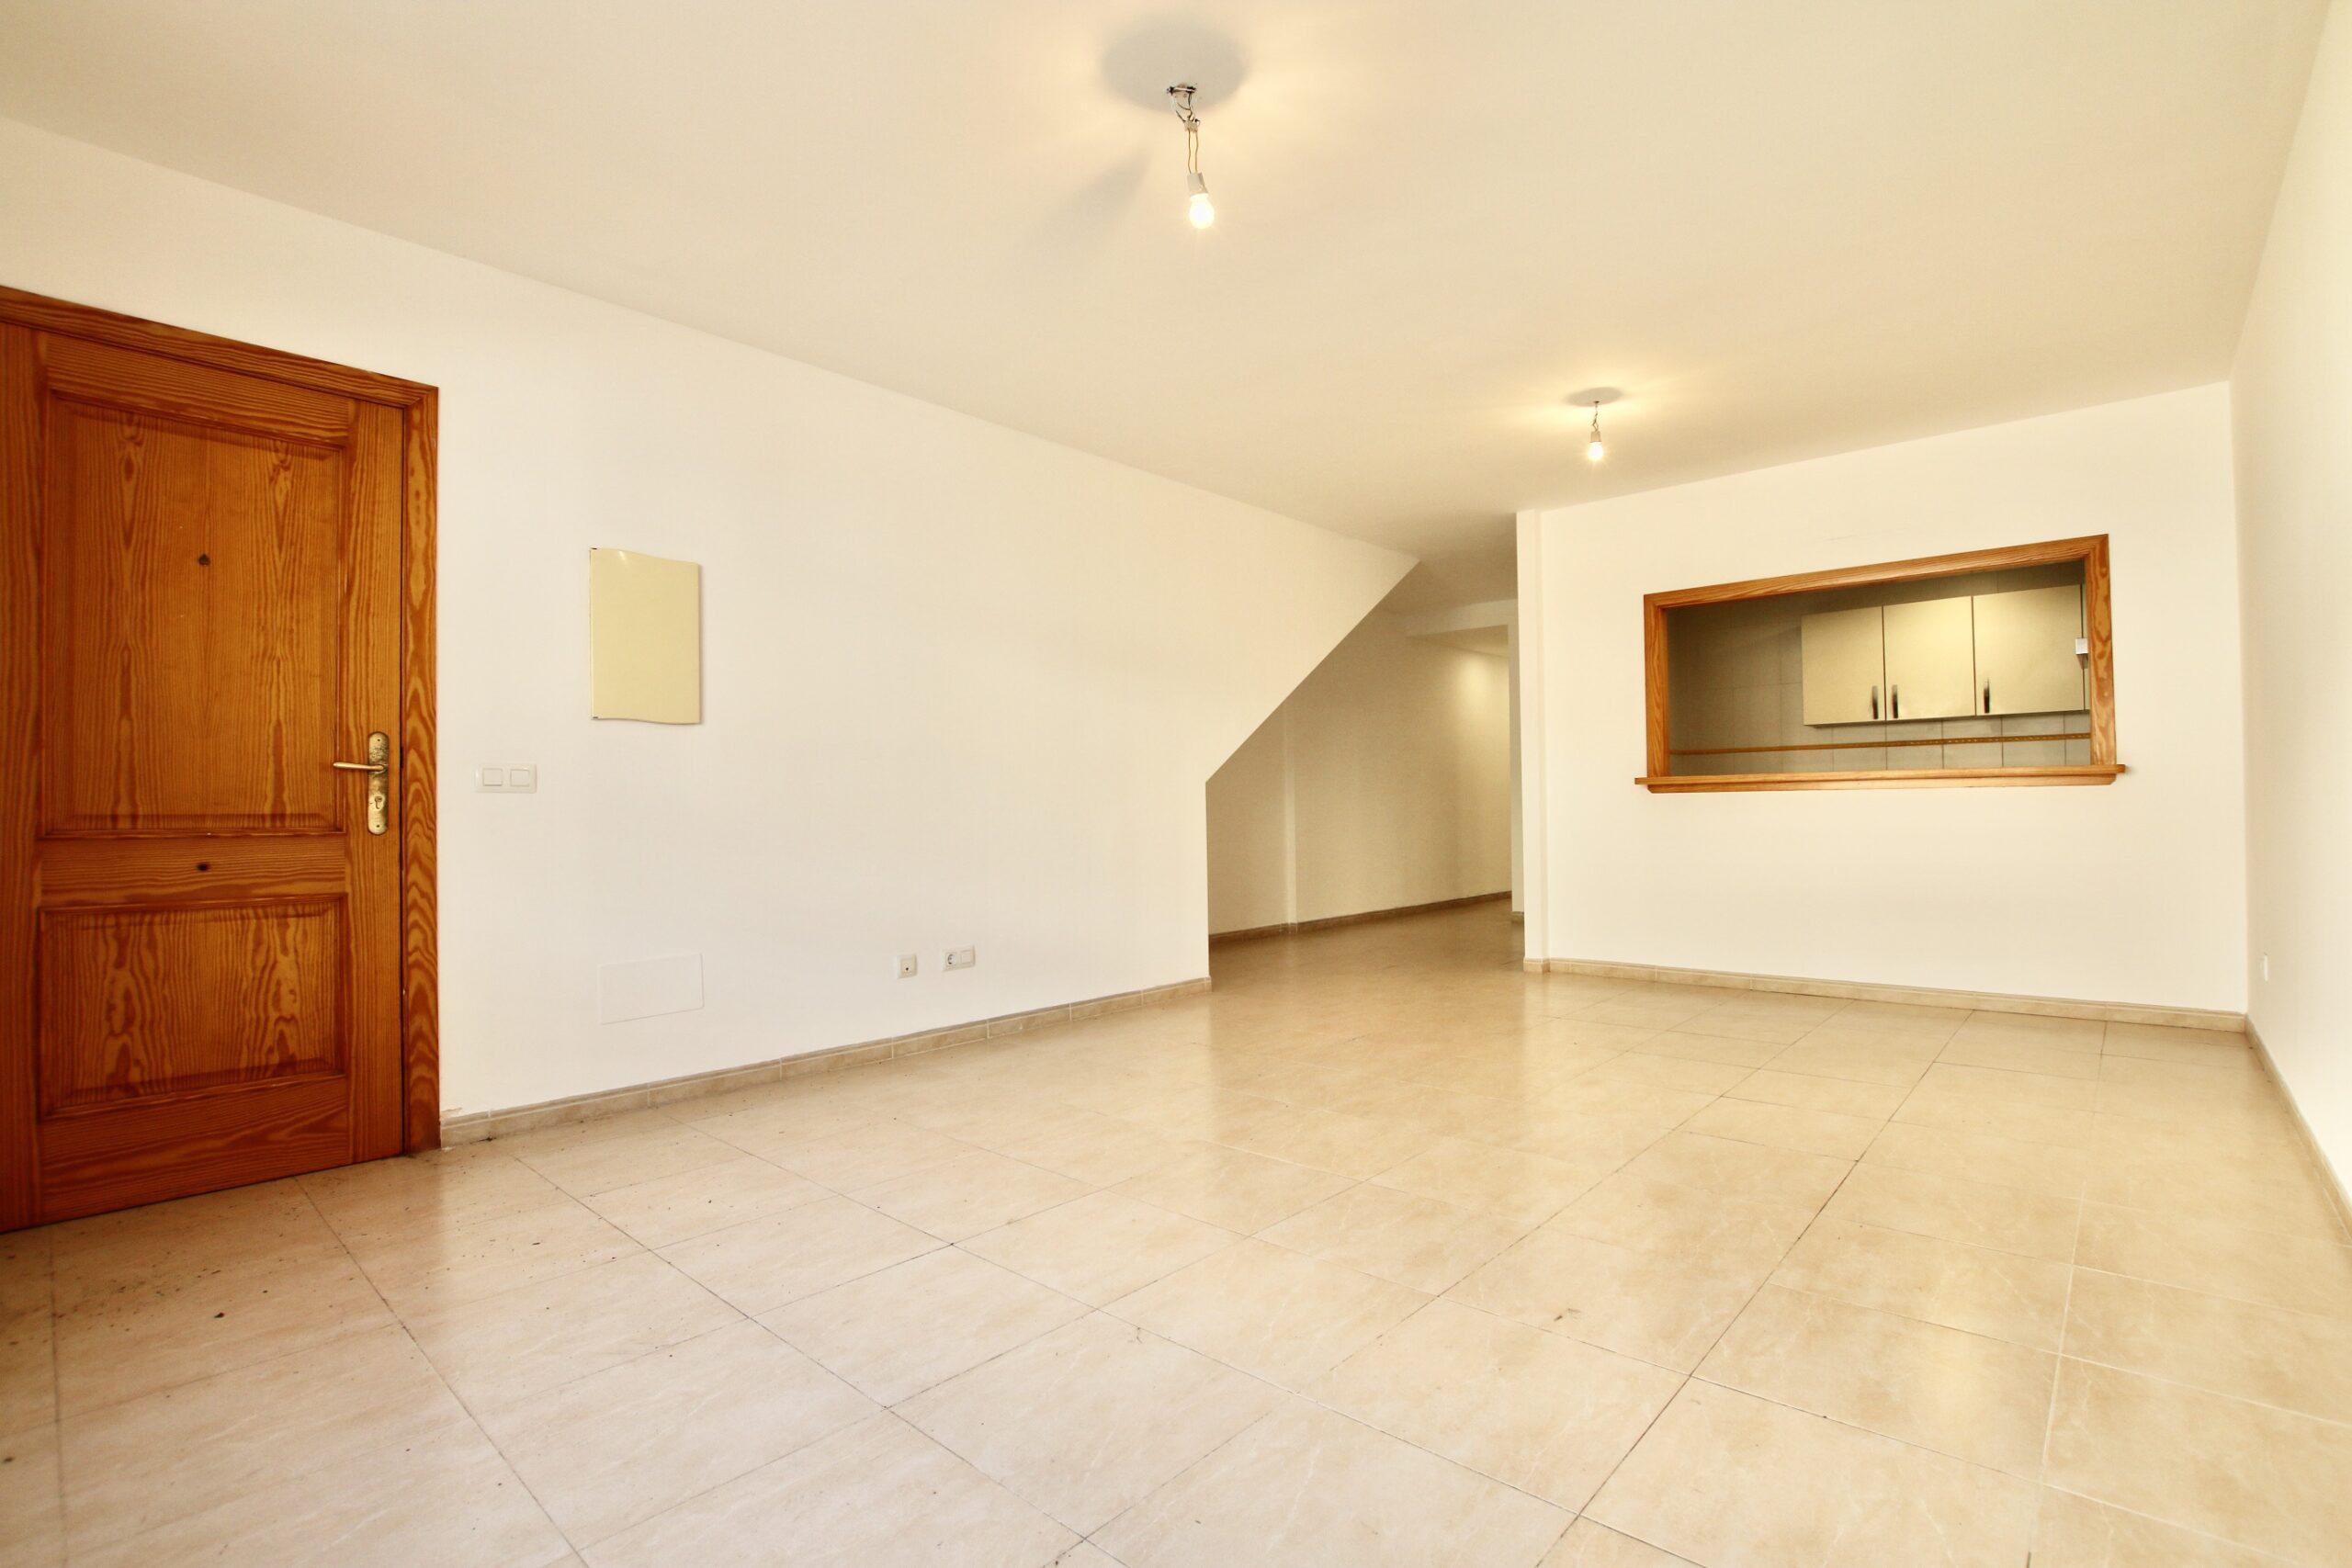 Cozy 2 beds / 1 bath ground floor apartment in Coll den Rabassa @ Palma